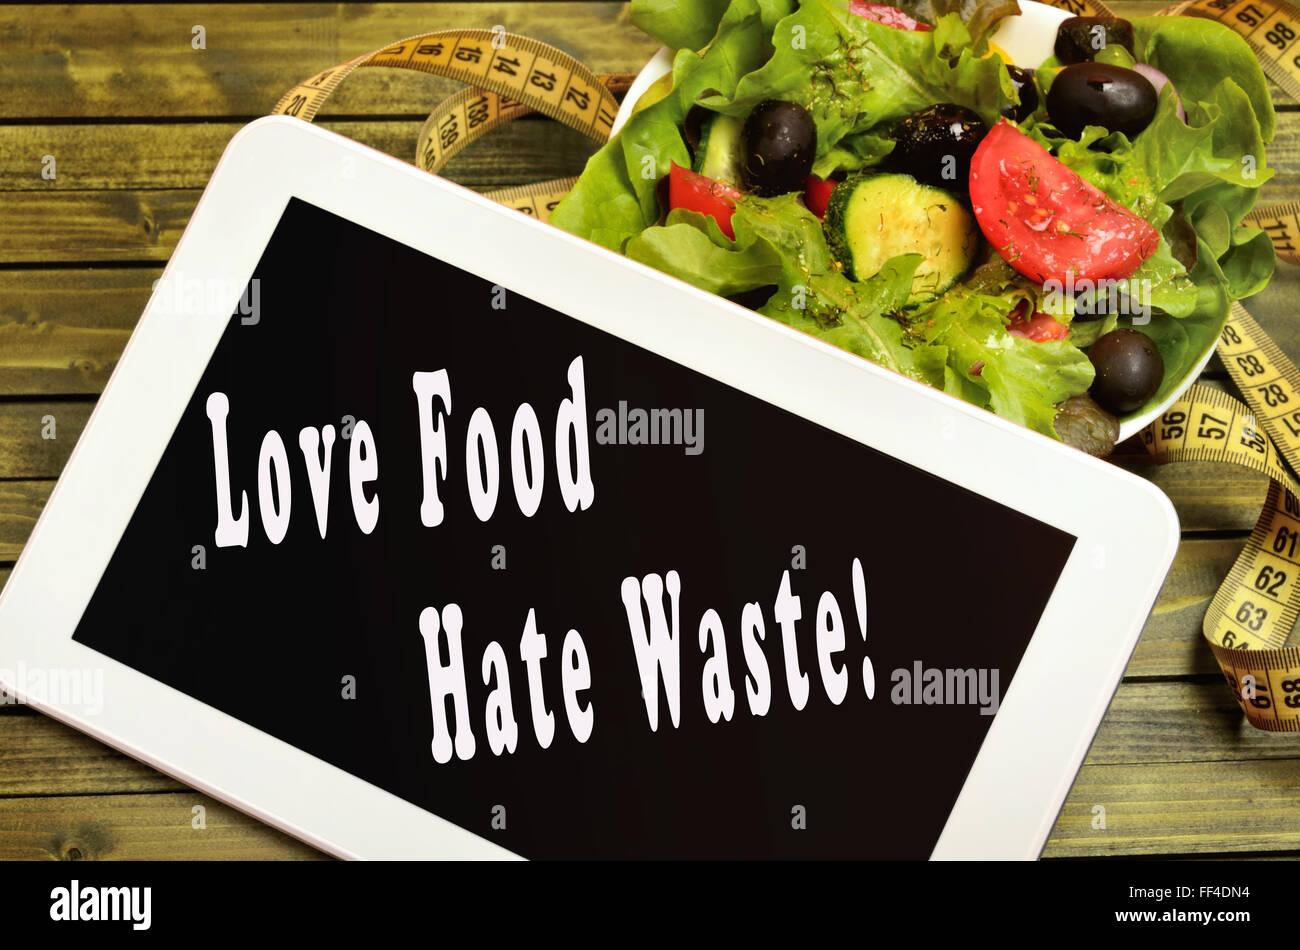 Love food Hate waste written on digital tablet - Stock Image